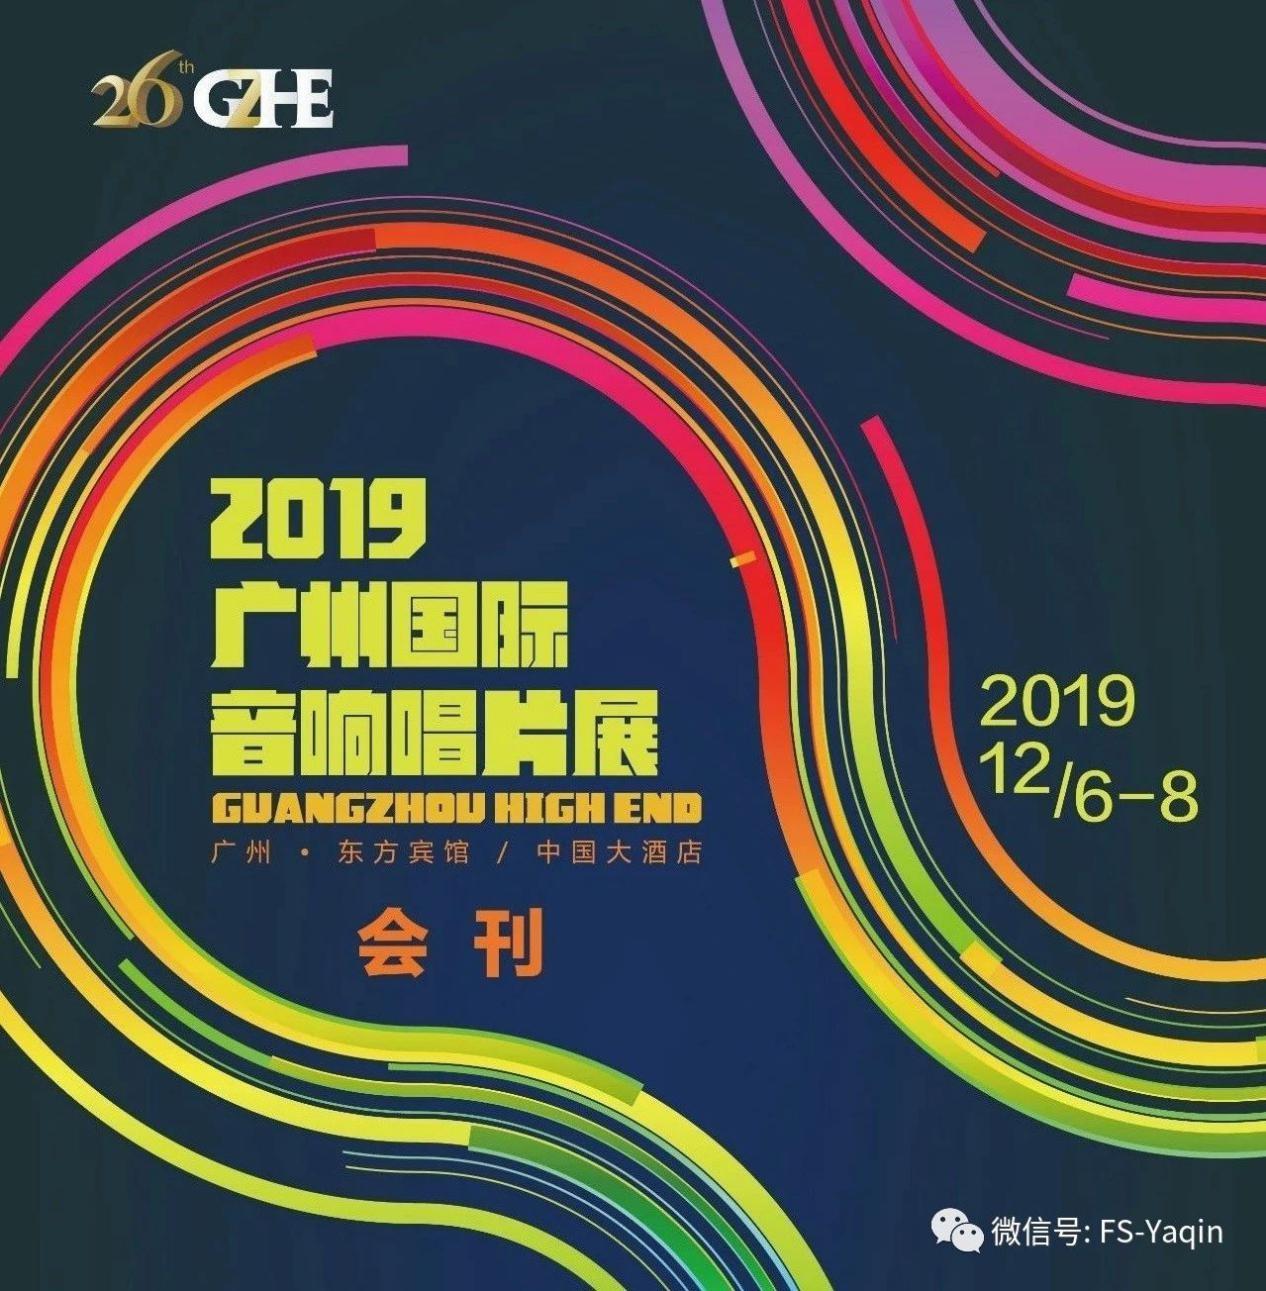 Guangzhou International Audio & records exhibition 2019